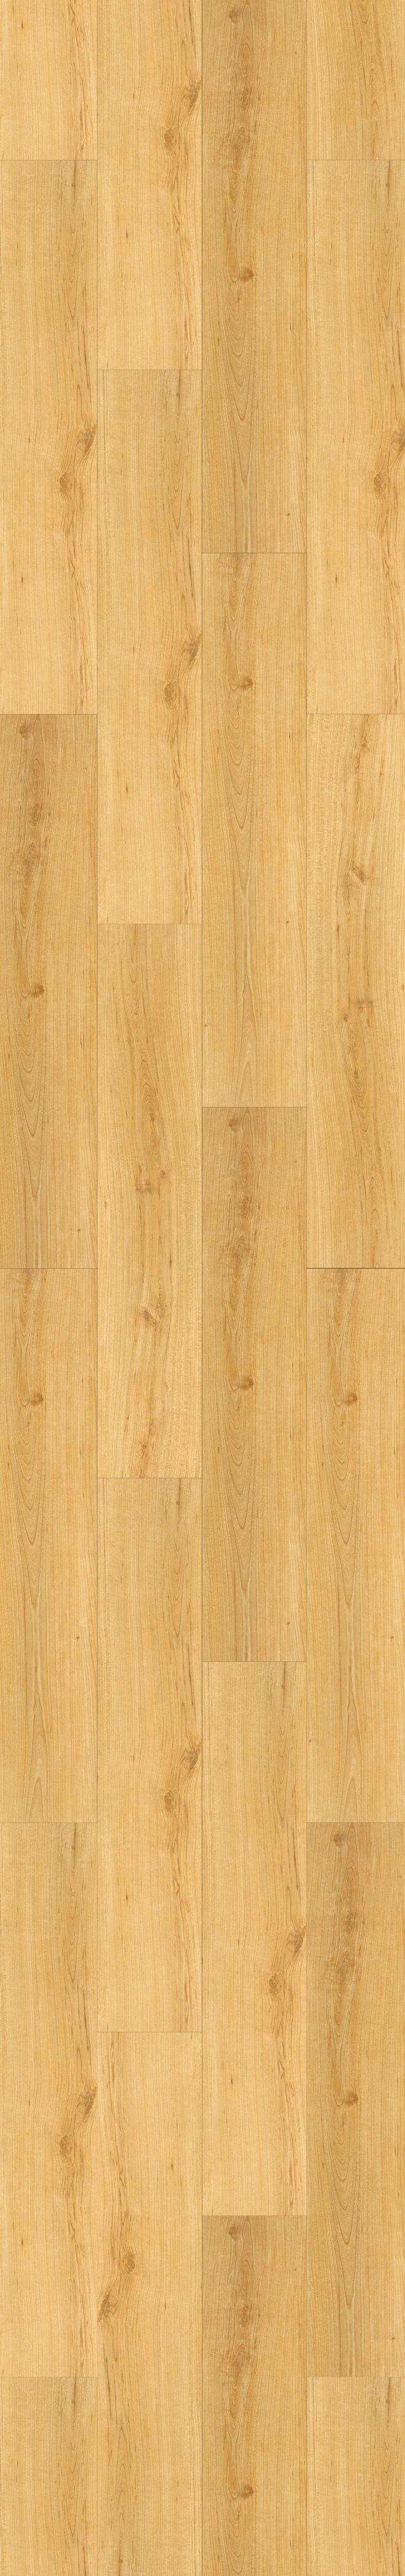 Flooring_에코노_(우드/180각) DEW2709-A2